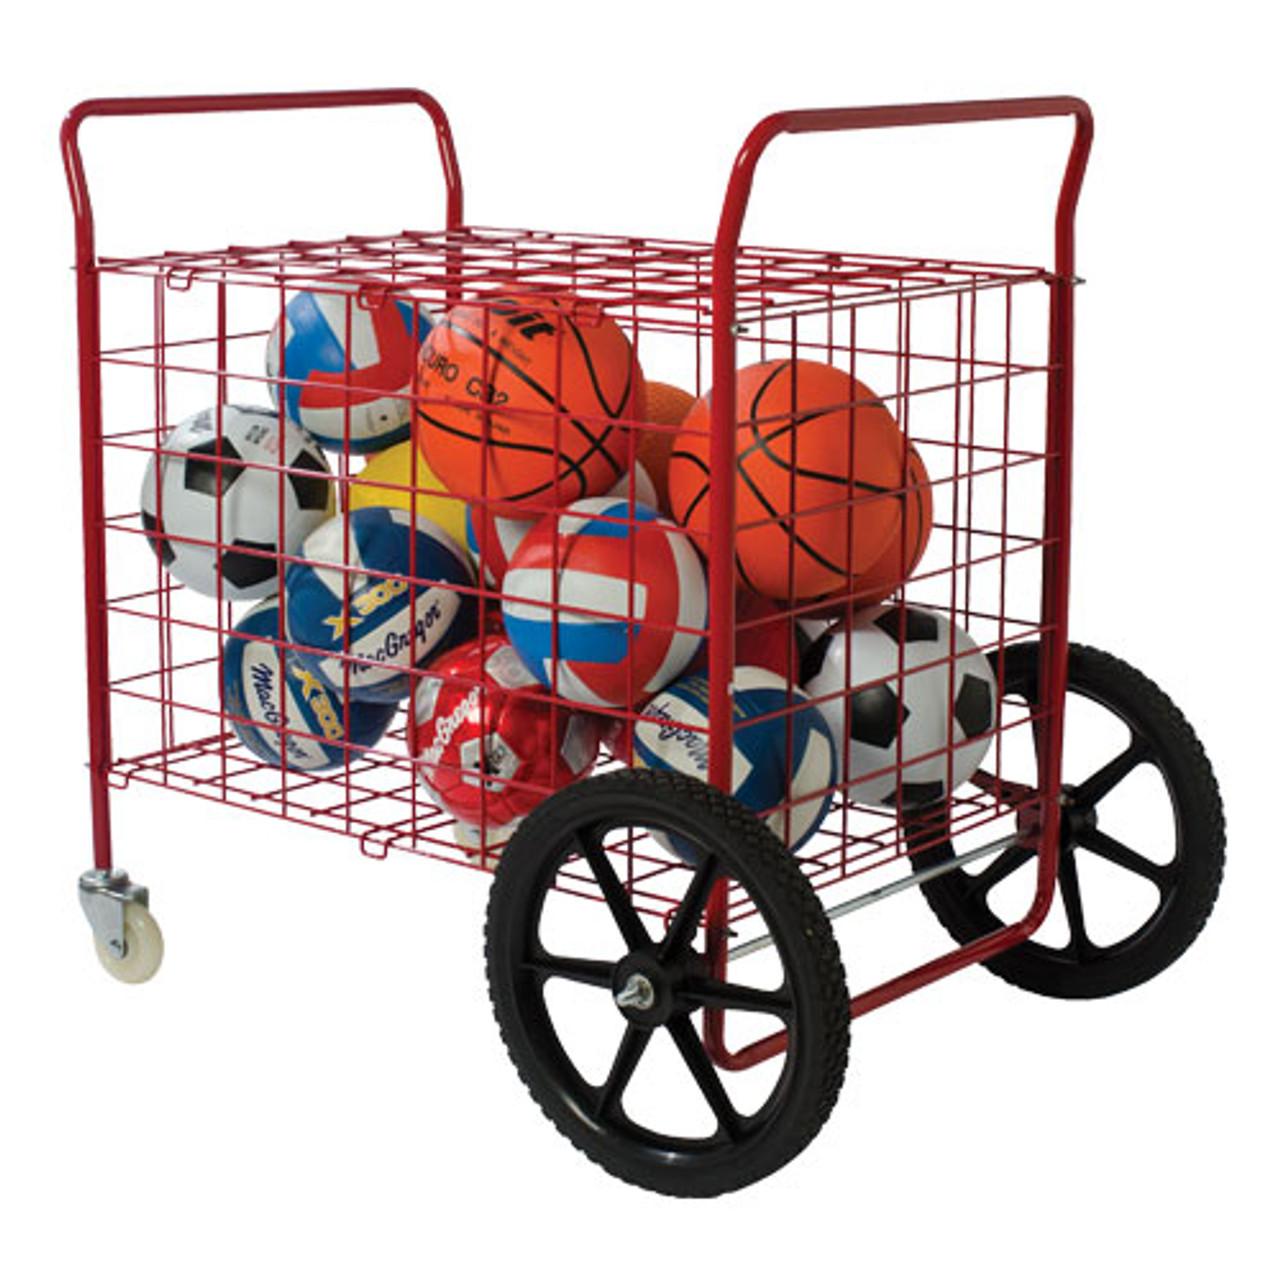 All-Terrain Ball Locker